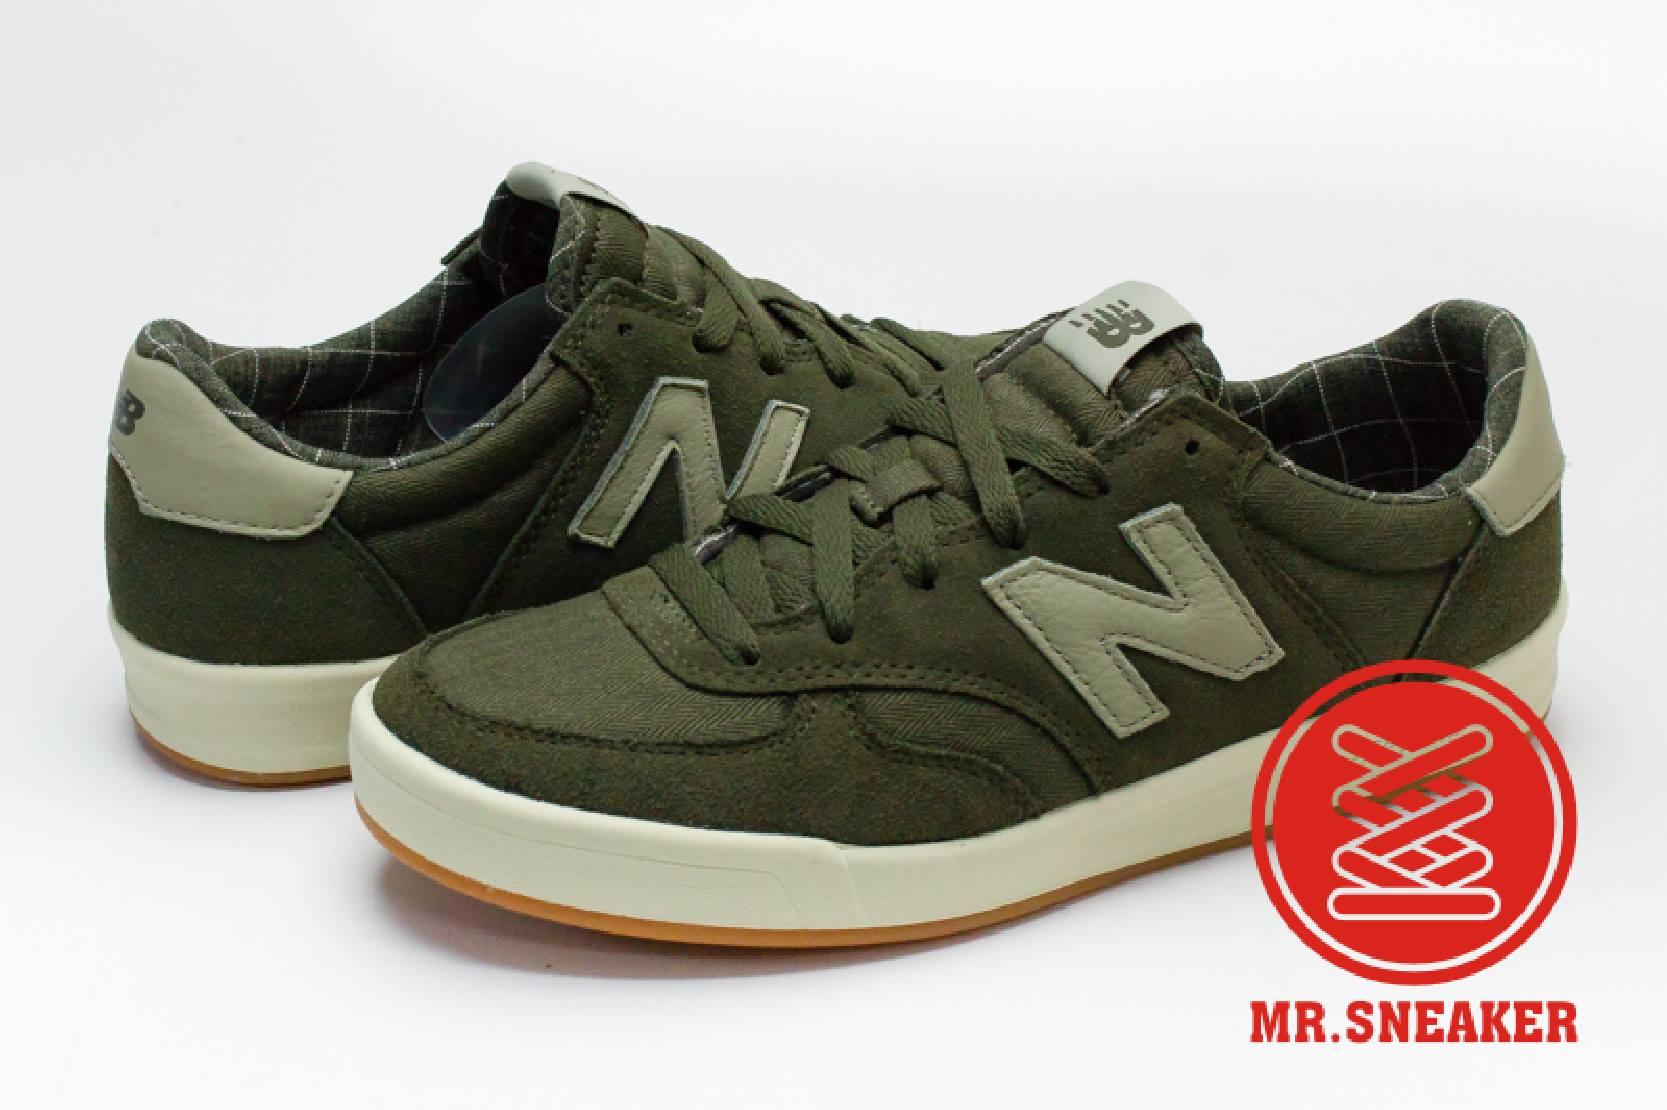 ☆Mr.Sneaker☆ NEW BALANCE CRT300 軍綠 格紋 復古 網球鞋